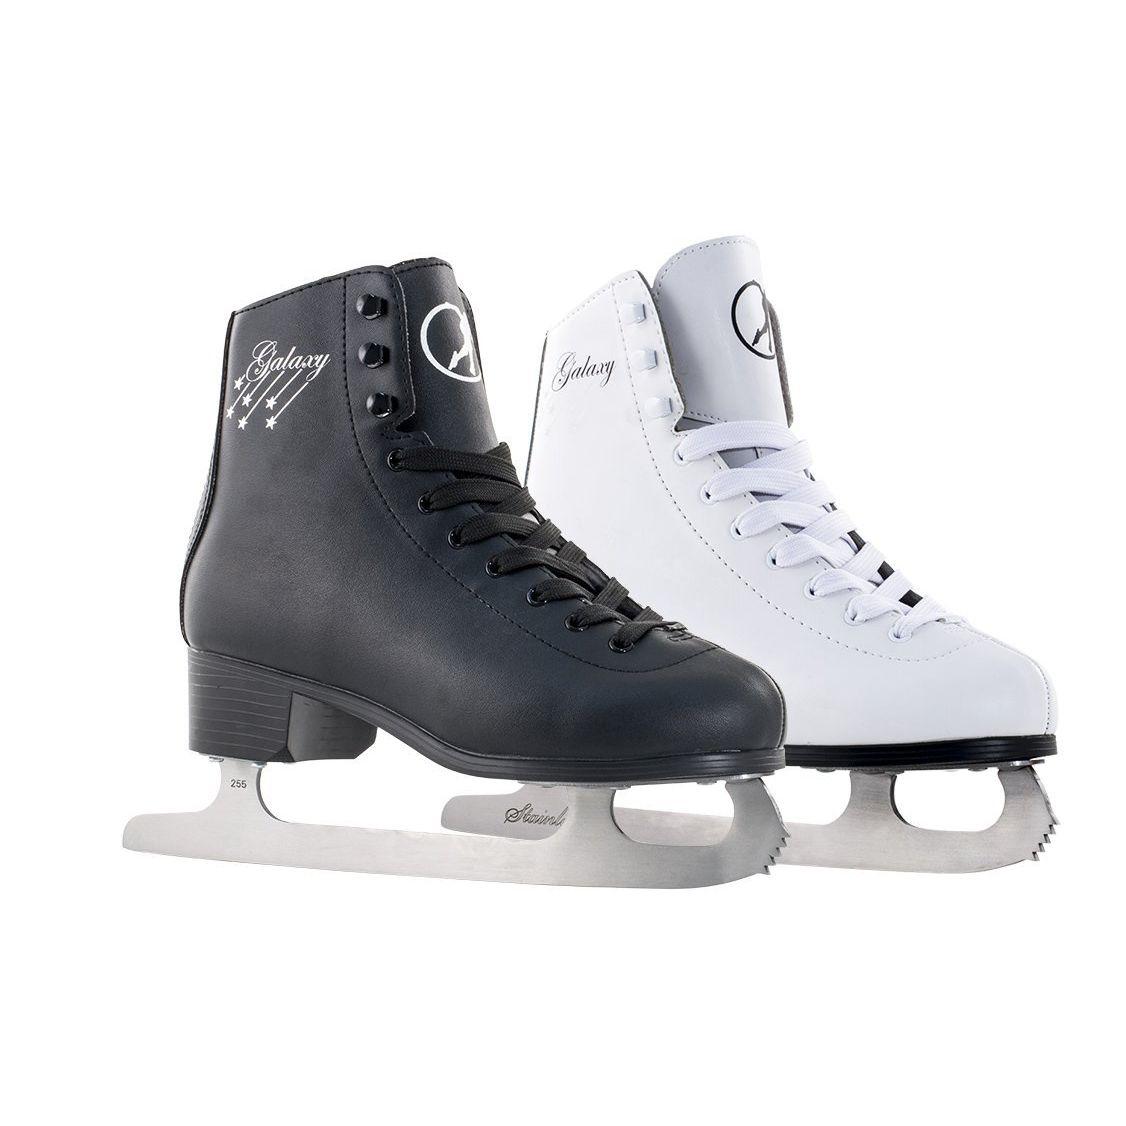 SFR White Galaxy Figure Ice Skates Women/'s Optional Pro Ice Skate Bag /& Guards